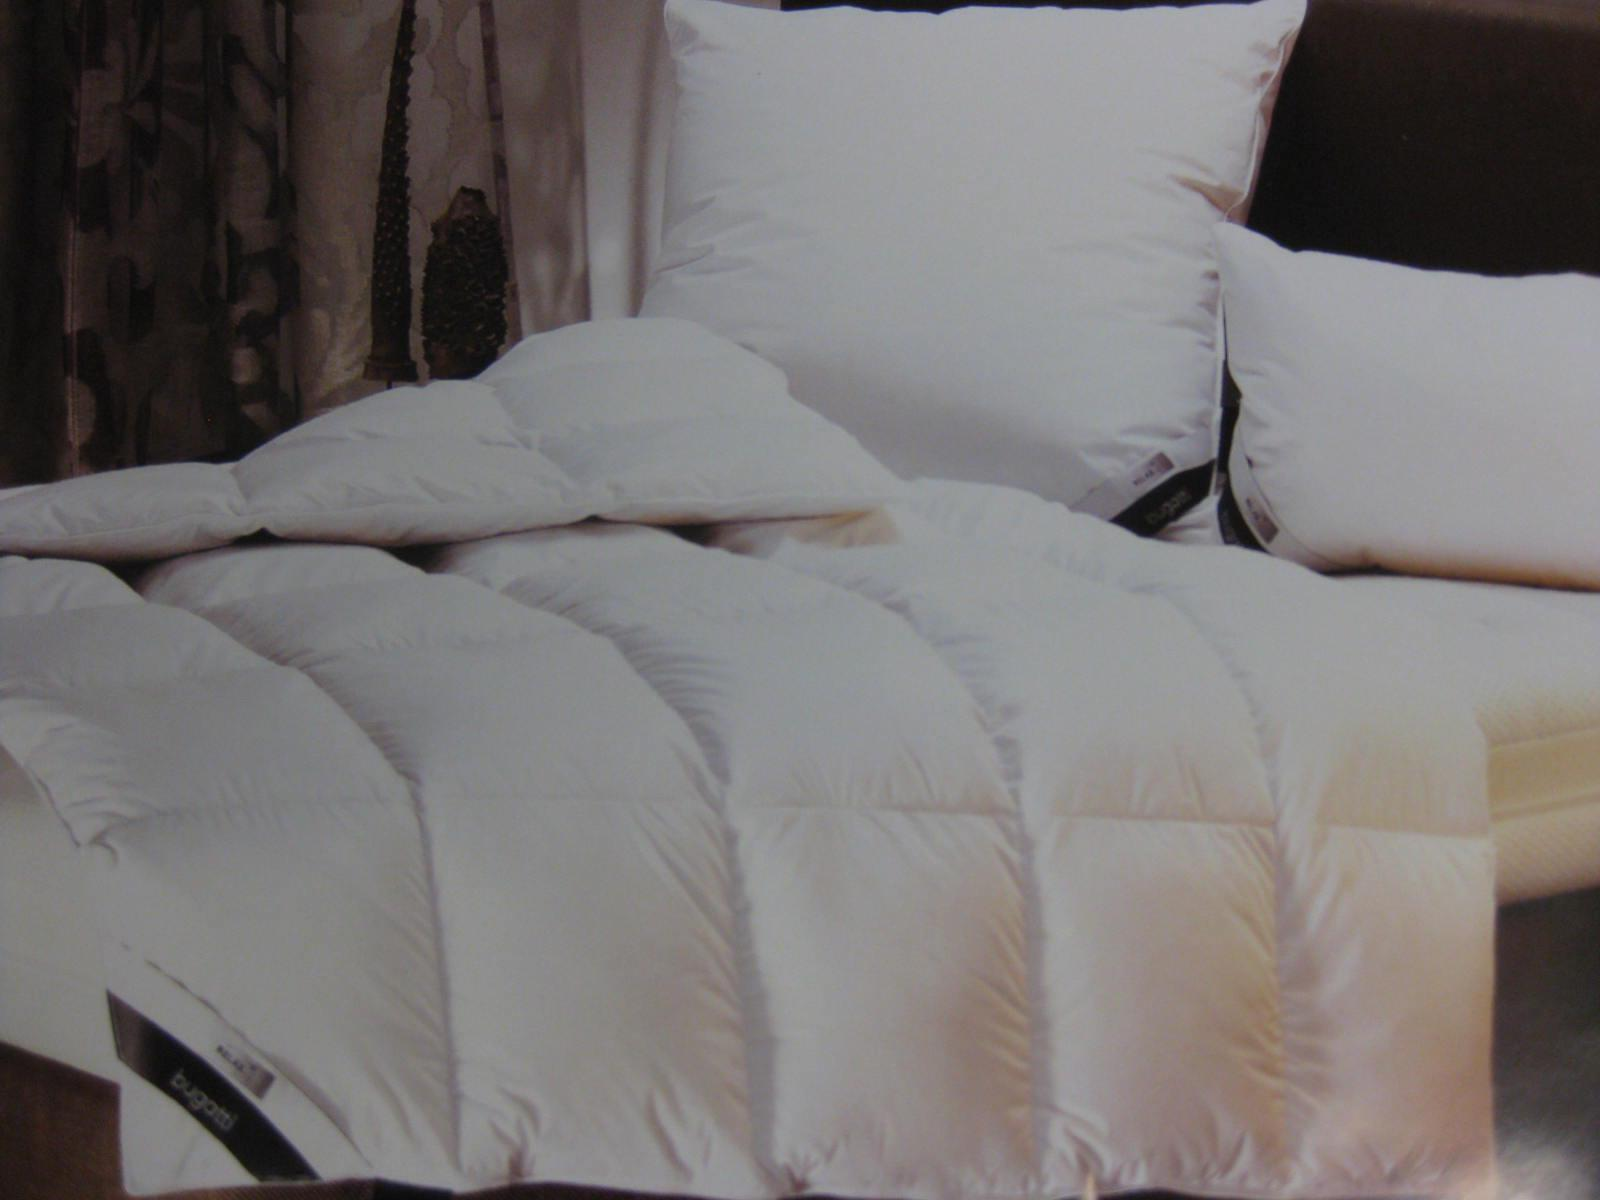 Danisches Bettenlager Sannwald Bettdecken Bettwasche Tom Tailor